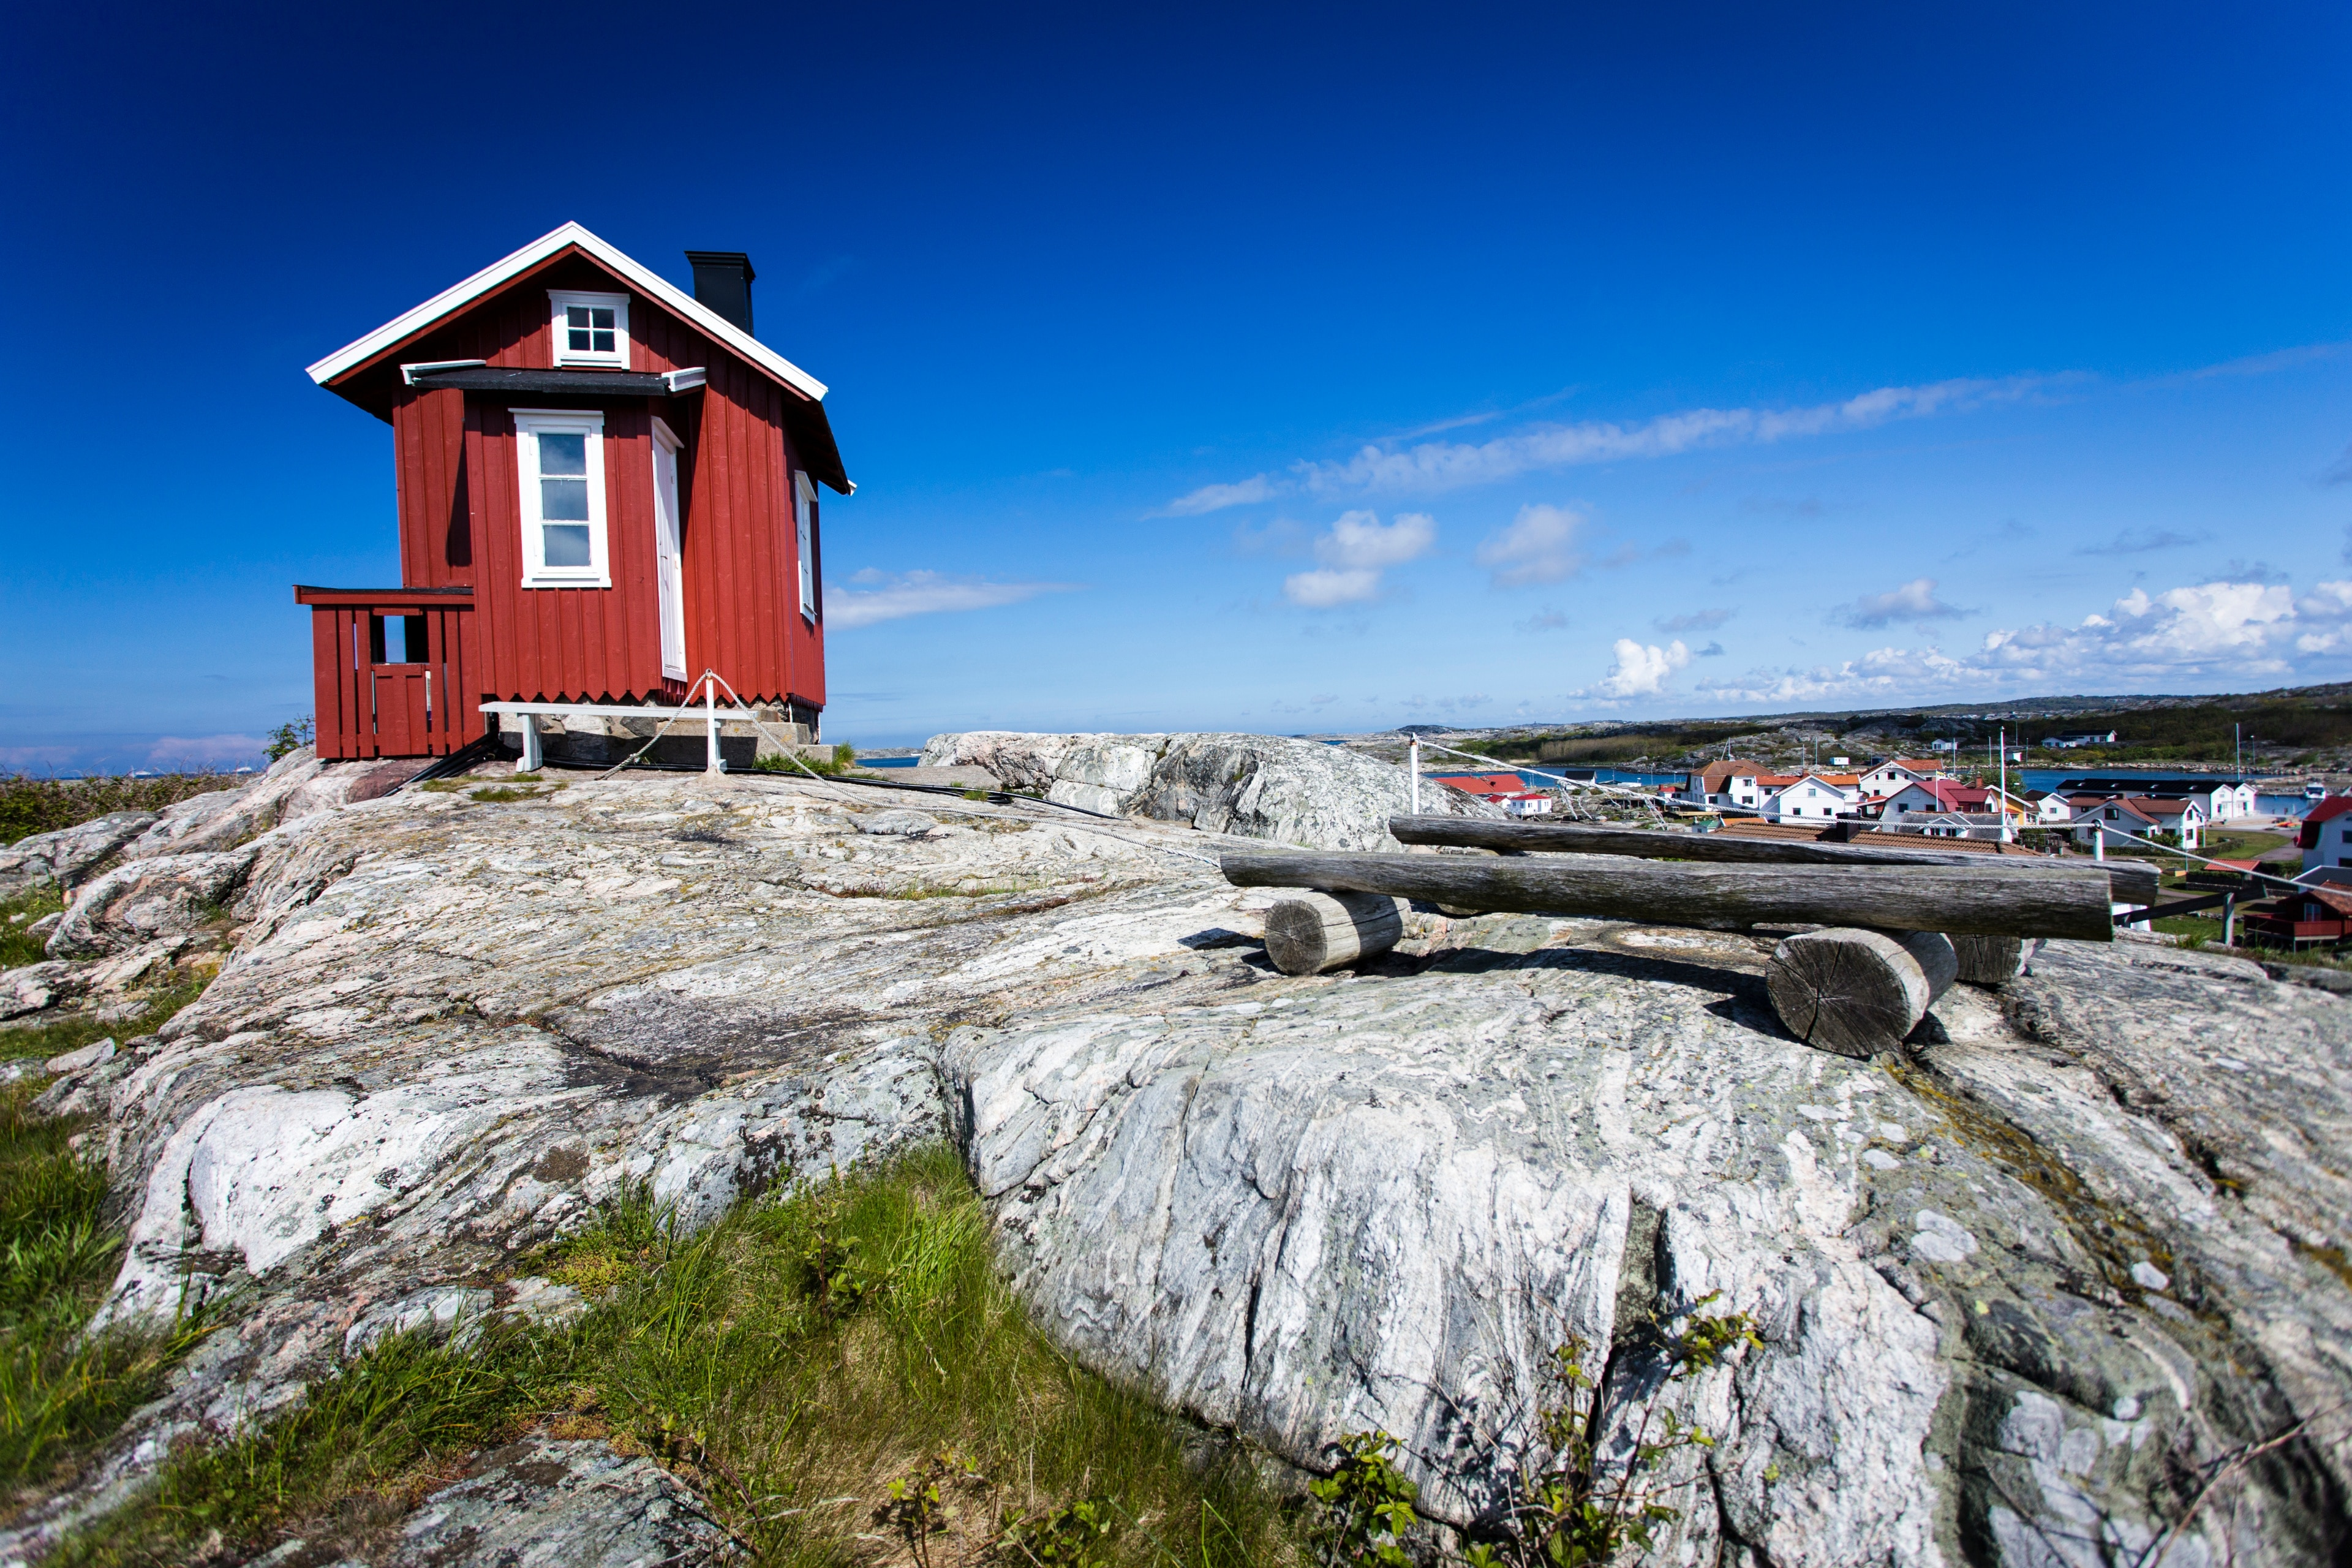 Archipelago of Gothenburg, Vastra Gotaland County, Sweden